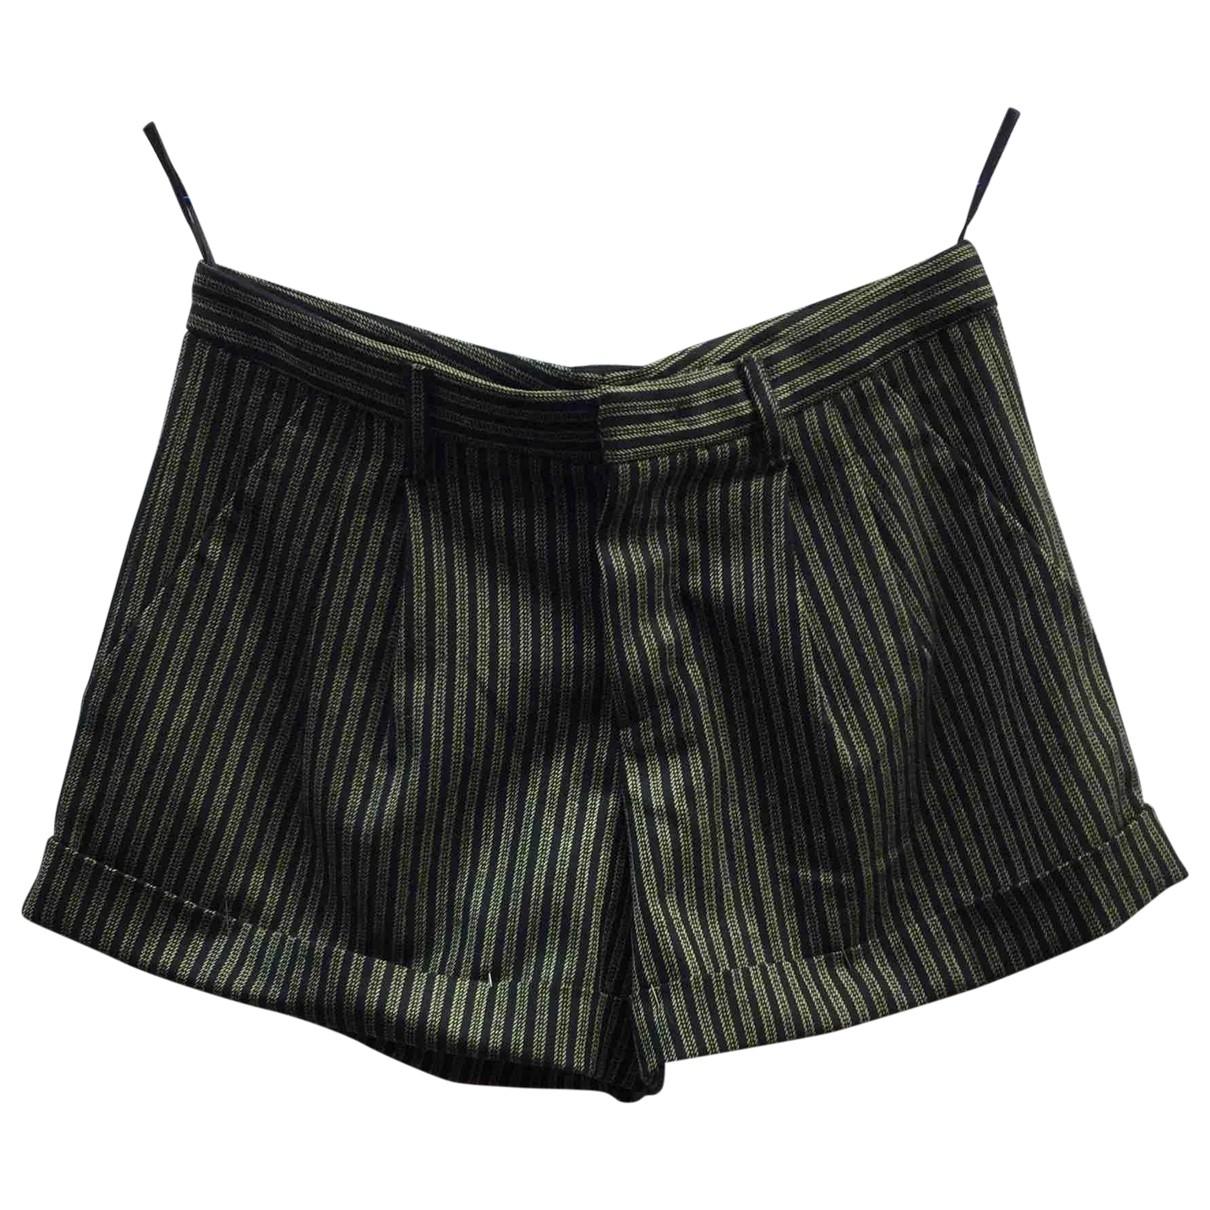 Miu Miu \N Shorts in  Khaki Wolle